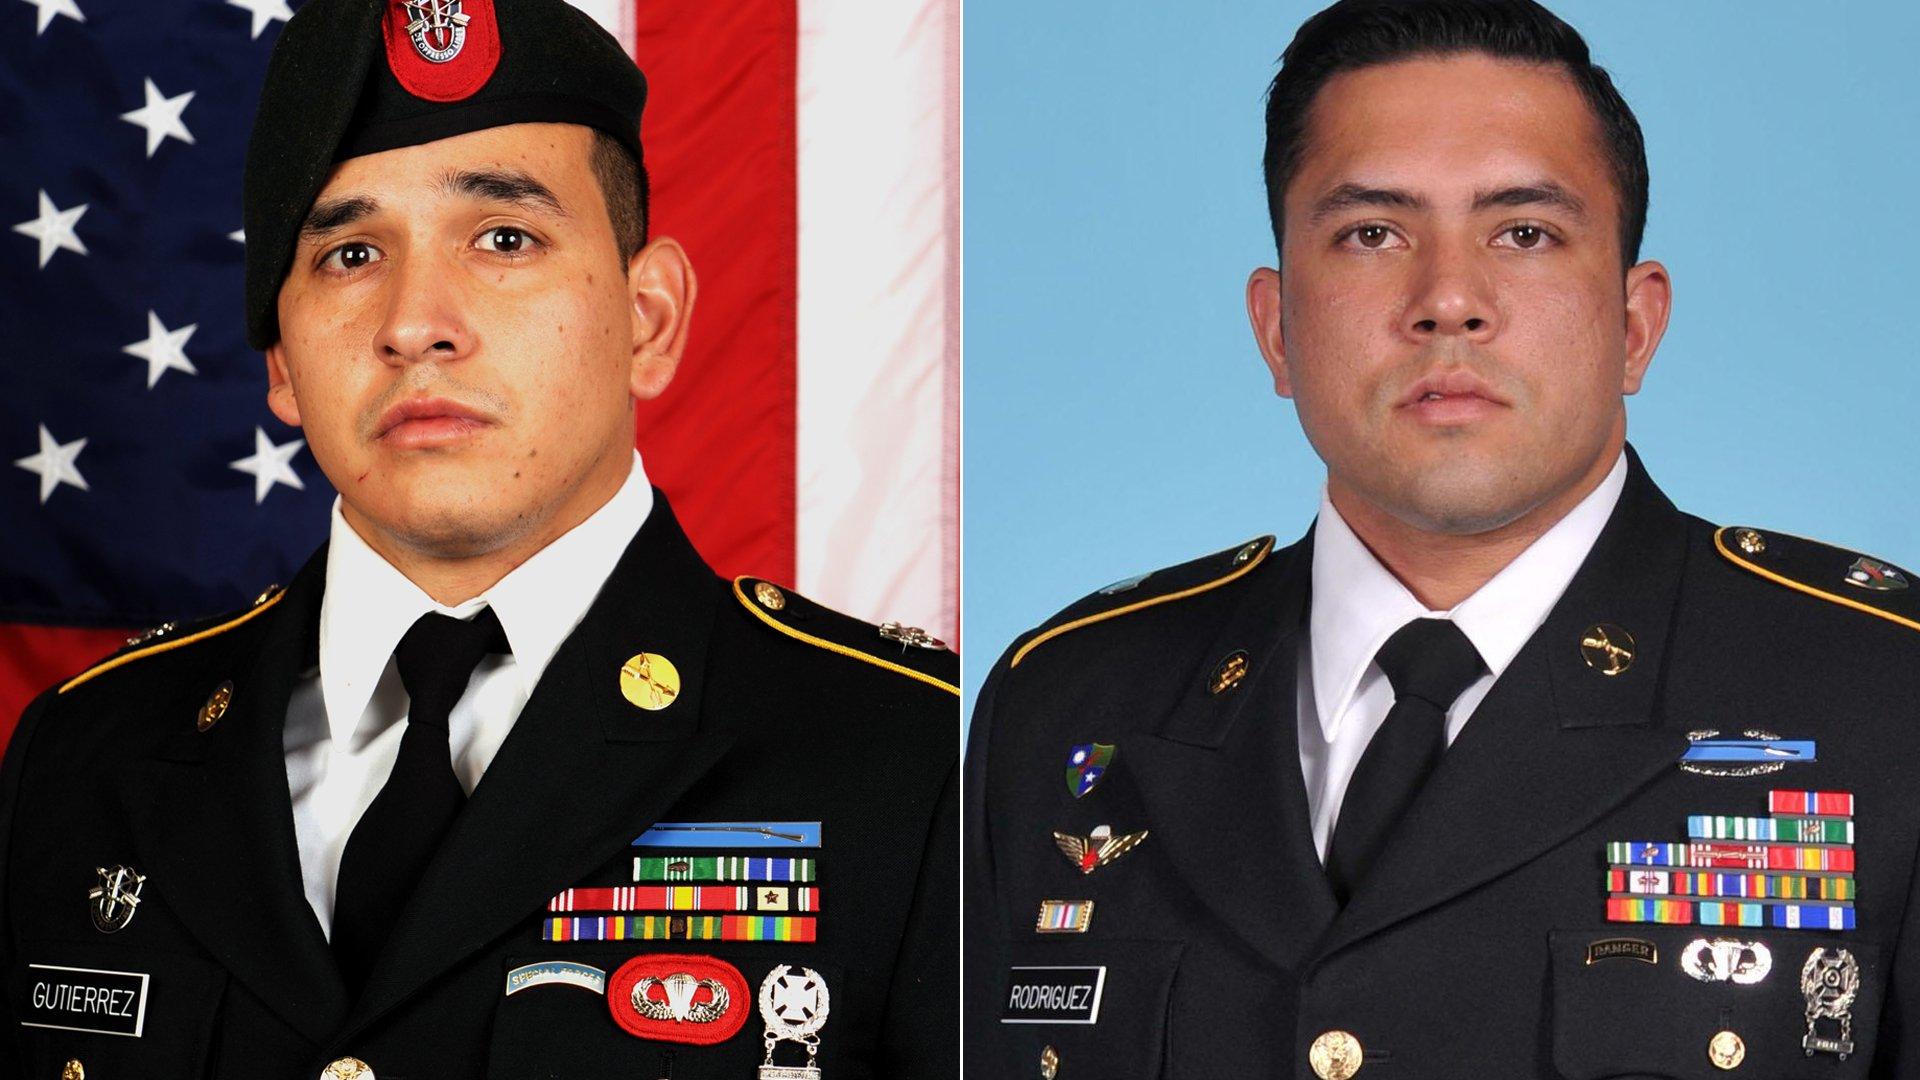 Javier Jaguar Gutierrez and Antonio Rey Rodriguez appear in photos released by the U.S. Department of Defense on Feb. 9, 2020.